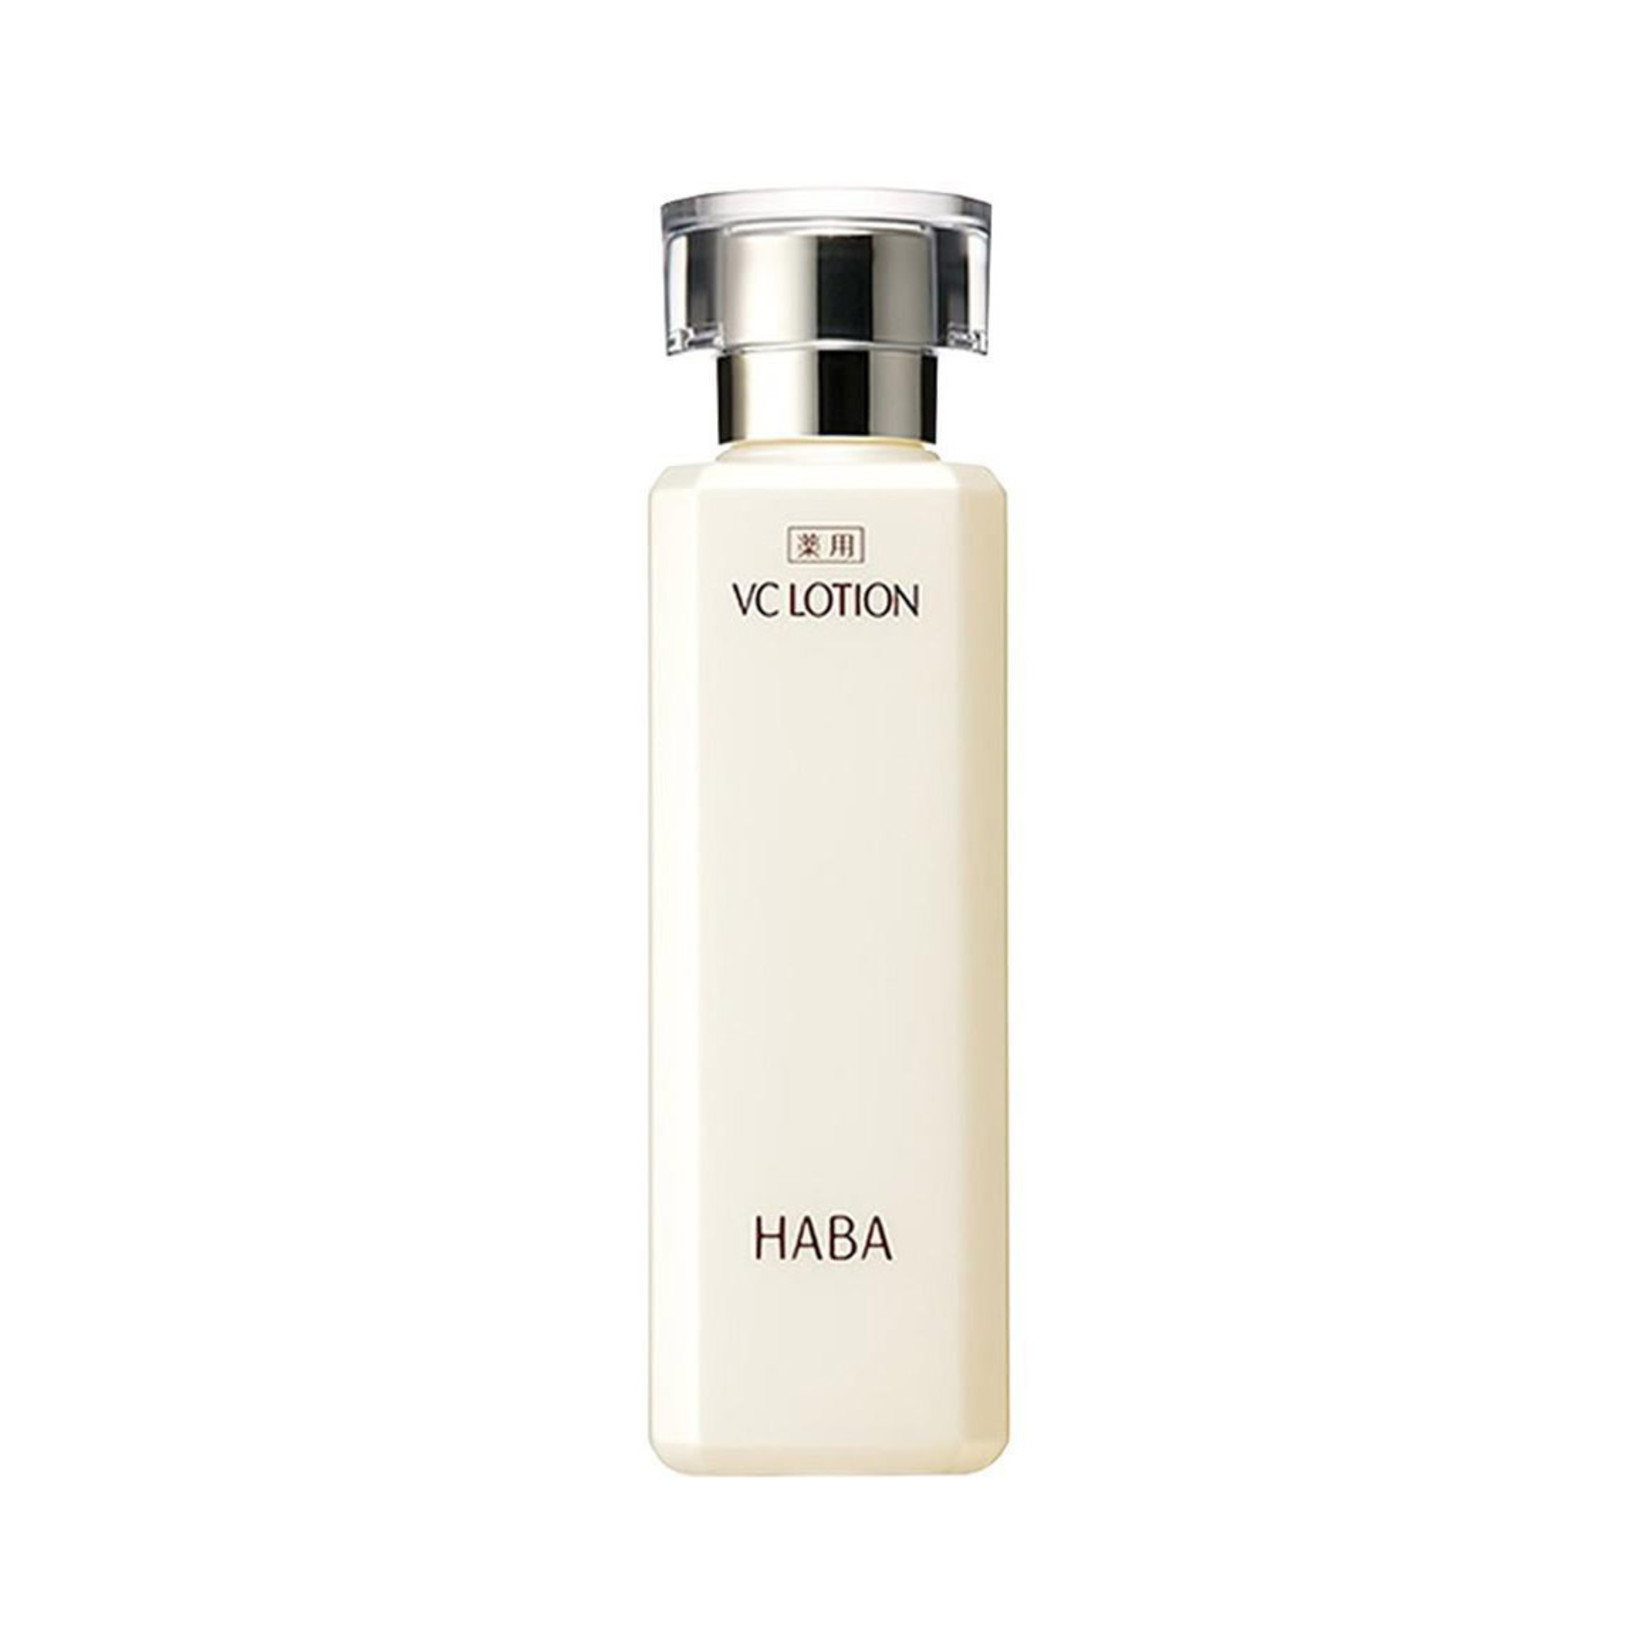 HABA Haba VC Lotion 180ml